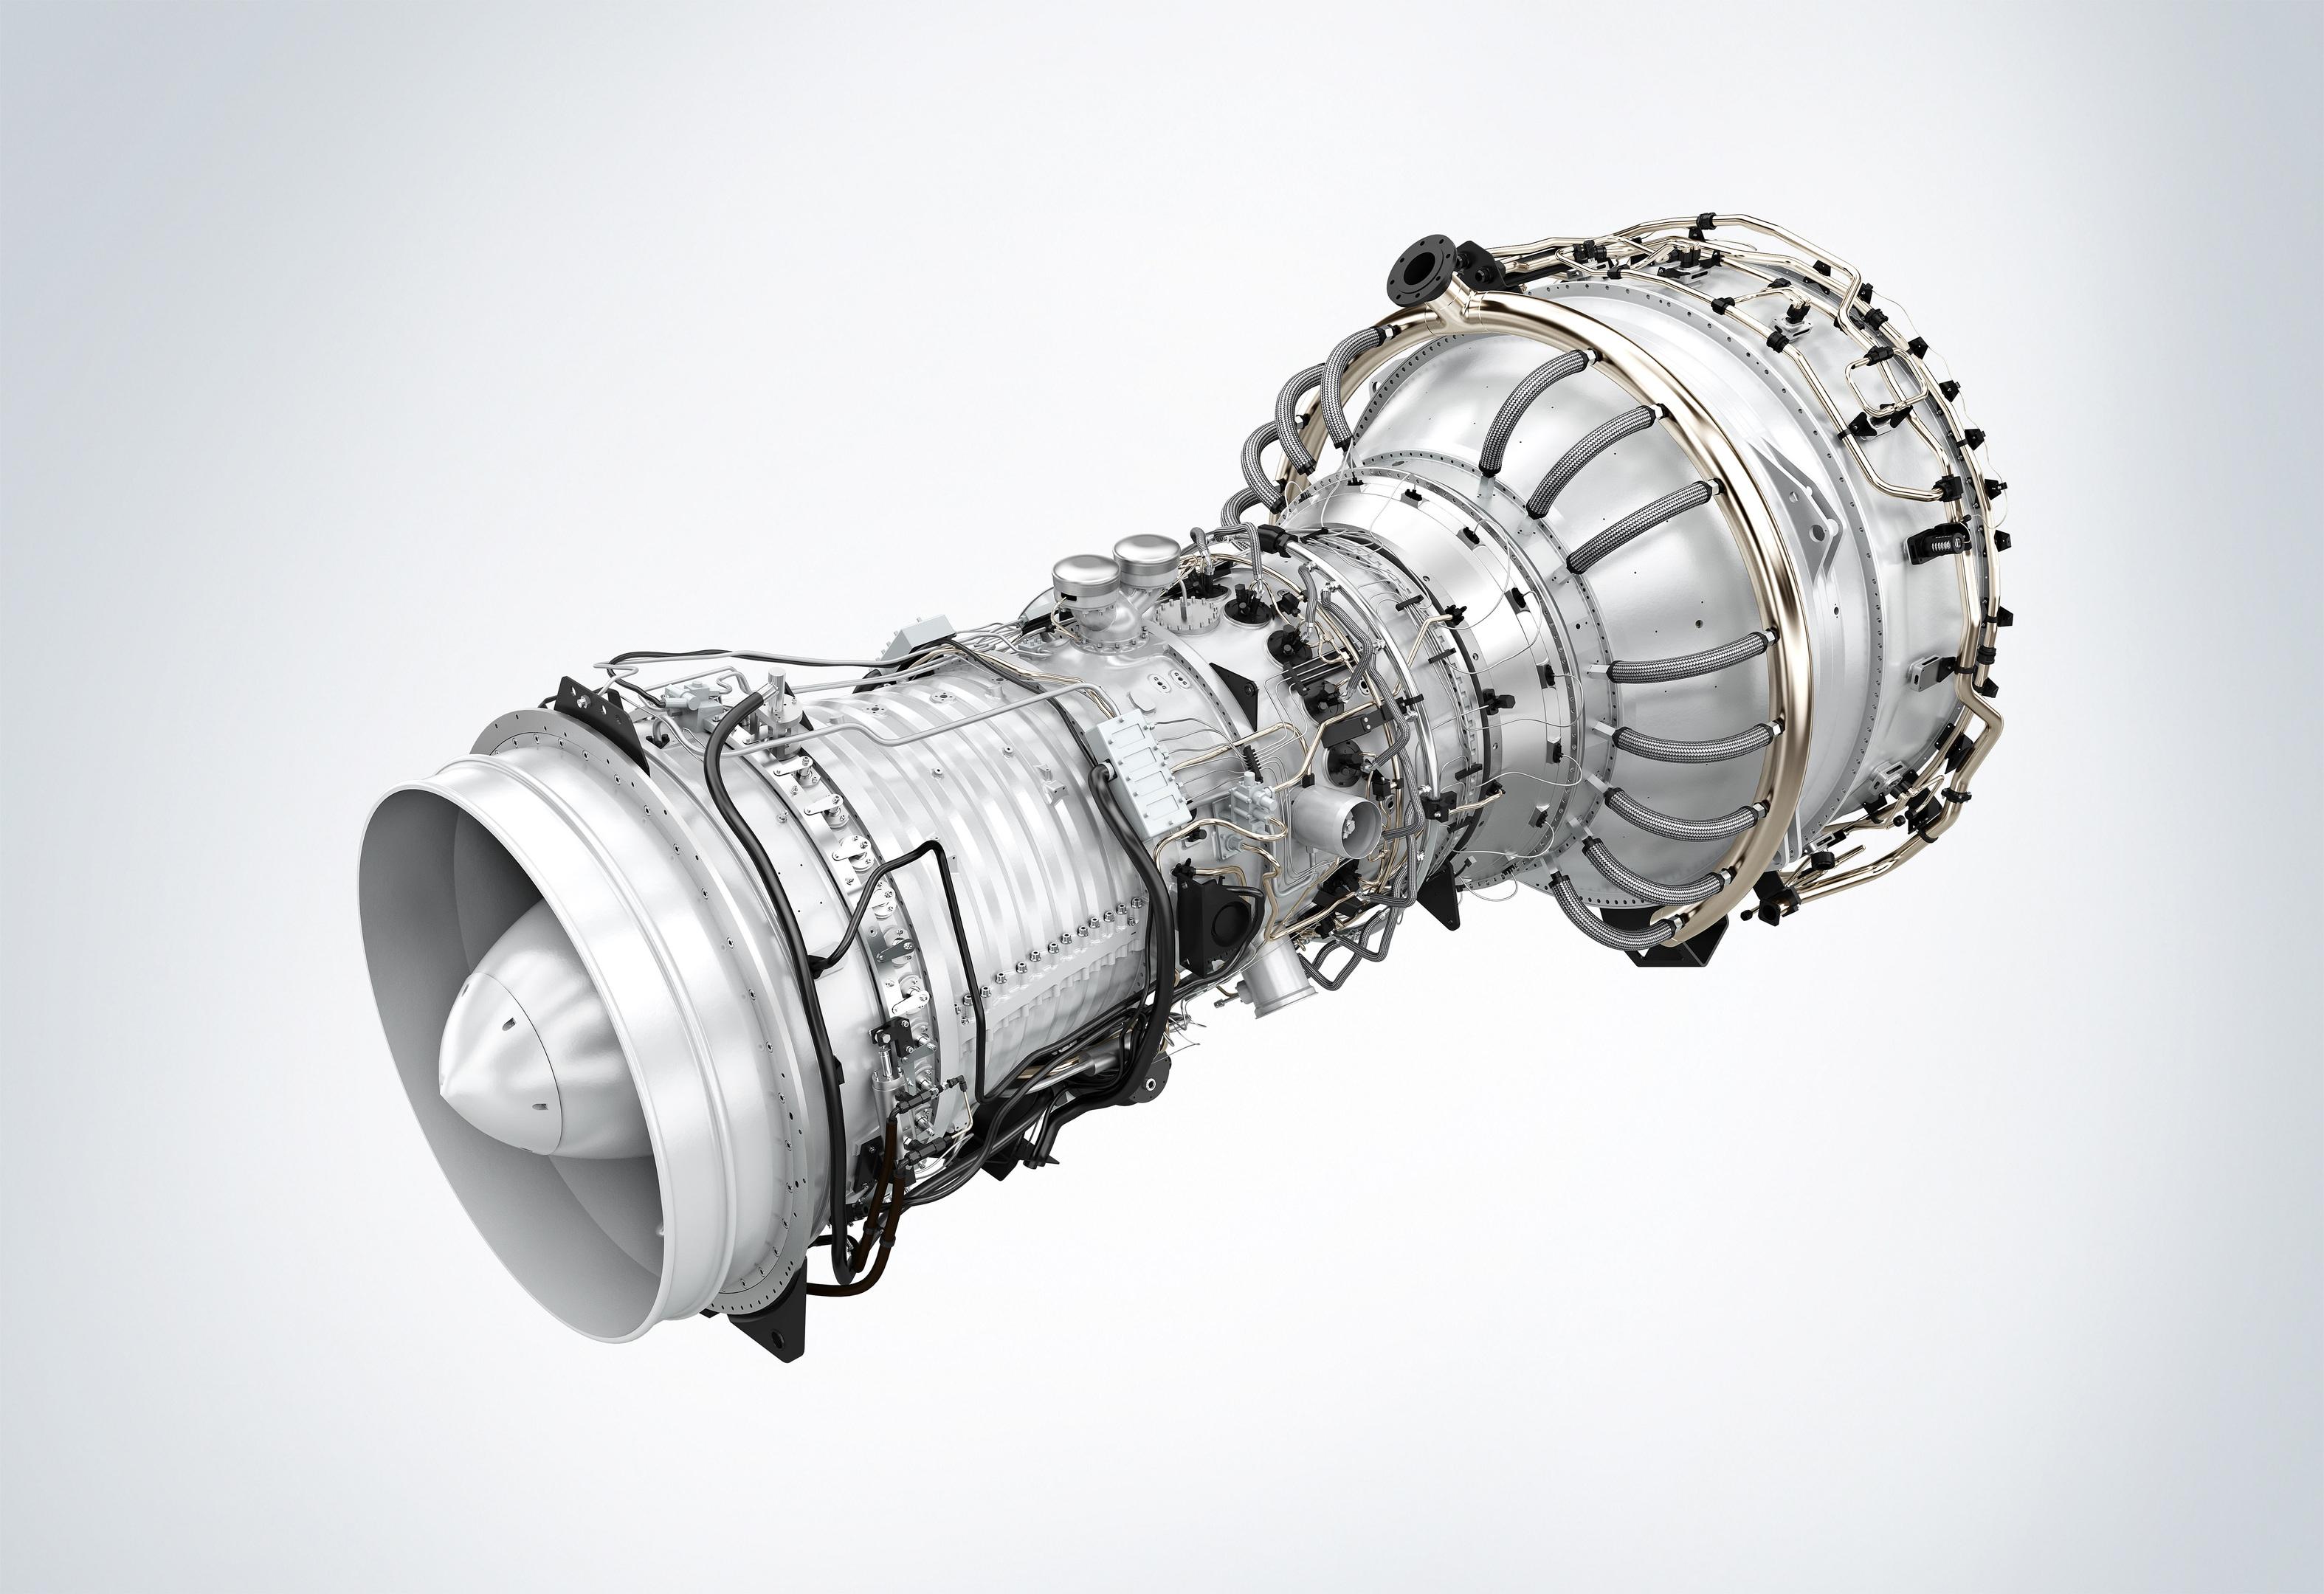 Siemens RB211-GT30  gas turbine for FPSOs